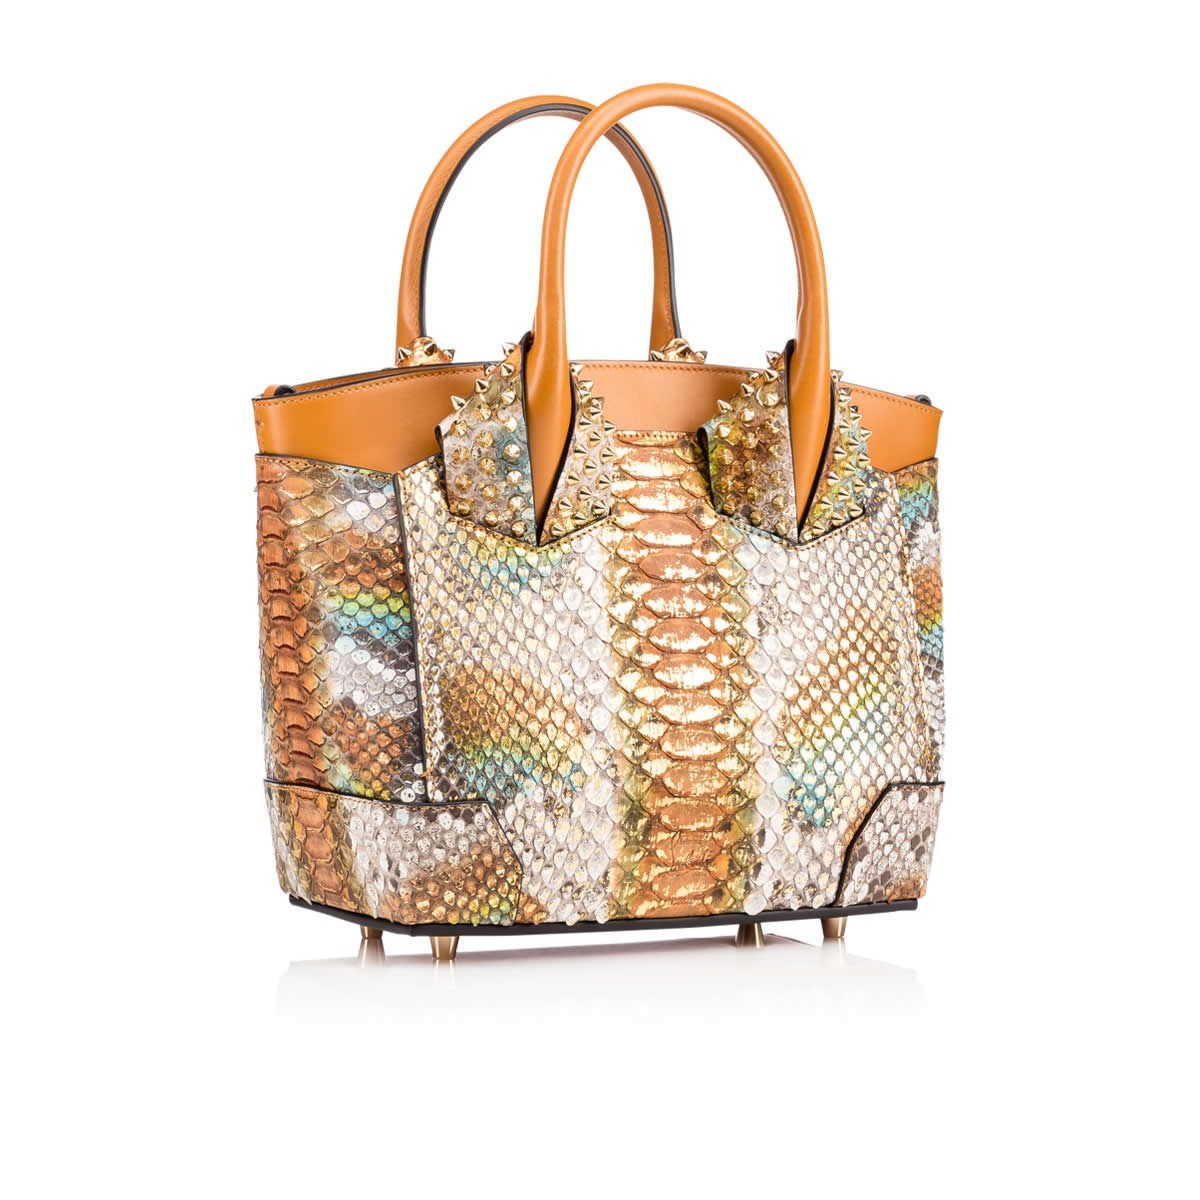 Foto de El nuevo 'it bag' de Christian Louboutin se llama 'Eloise' (3/8)